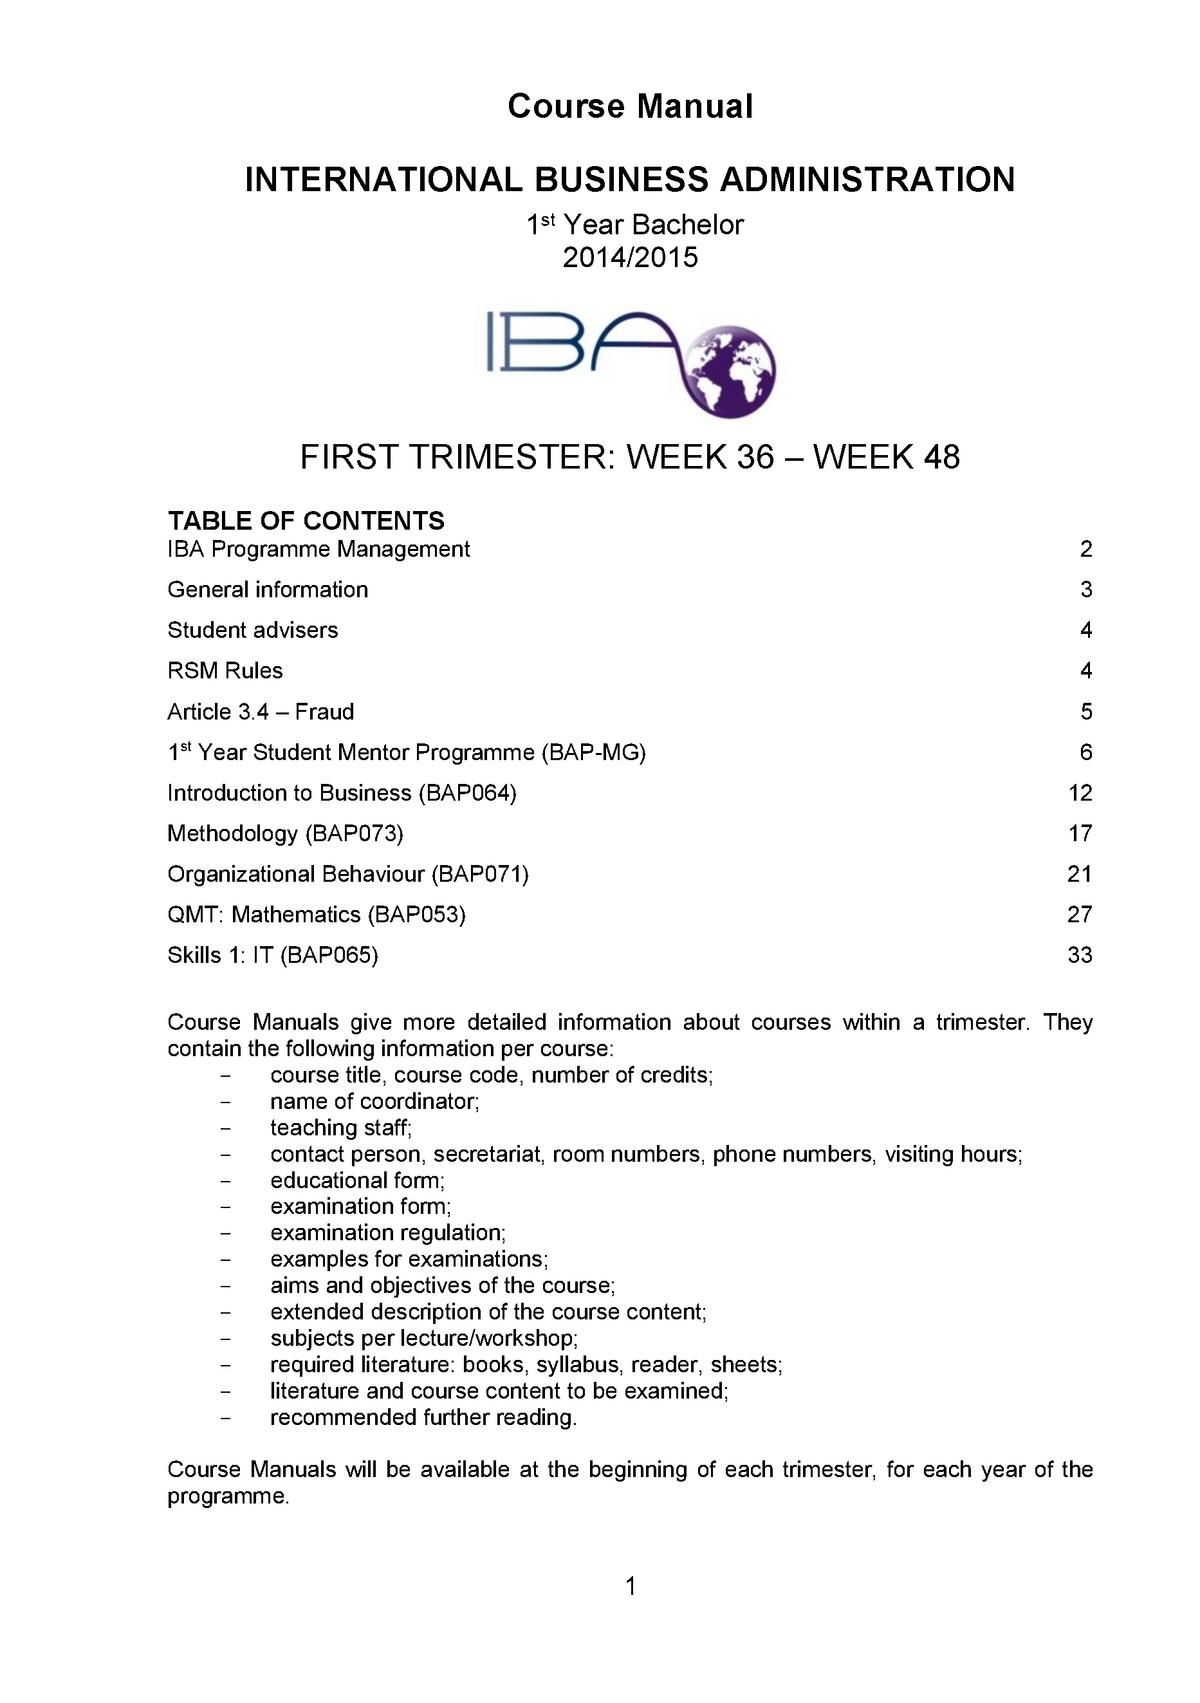 Course Manual IBA Bachelor 1 Trimester 1 2014-2015 Final